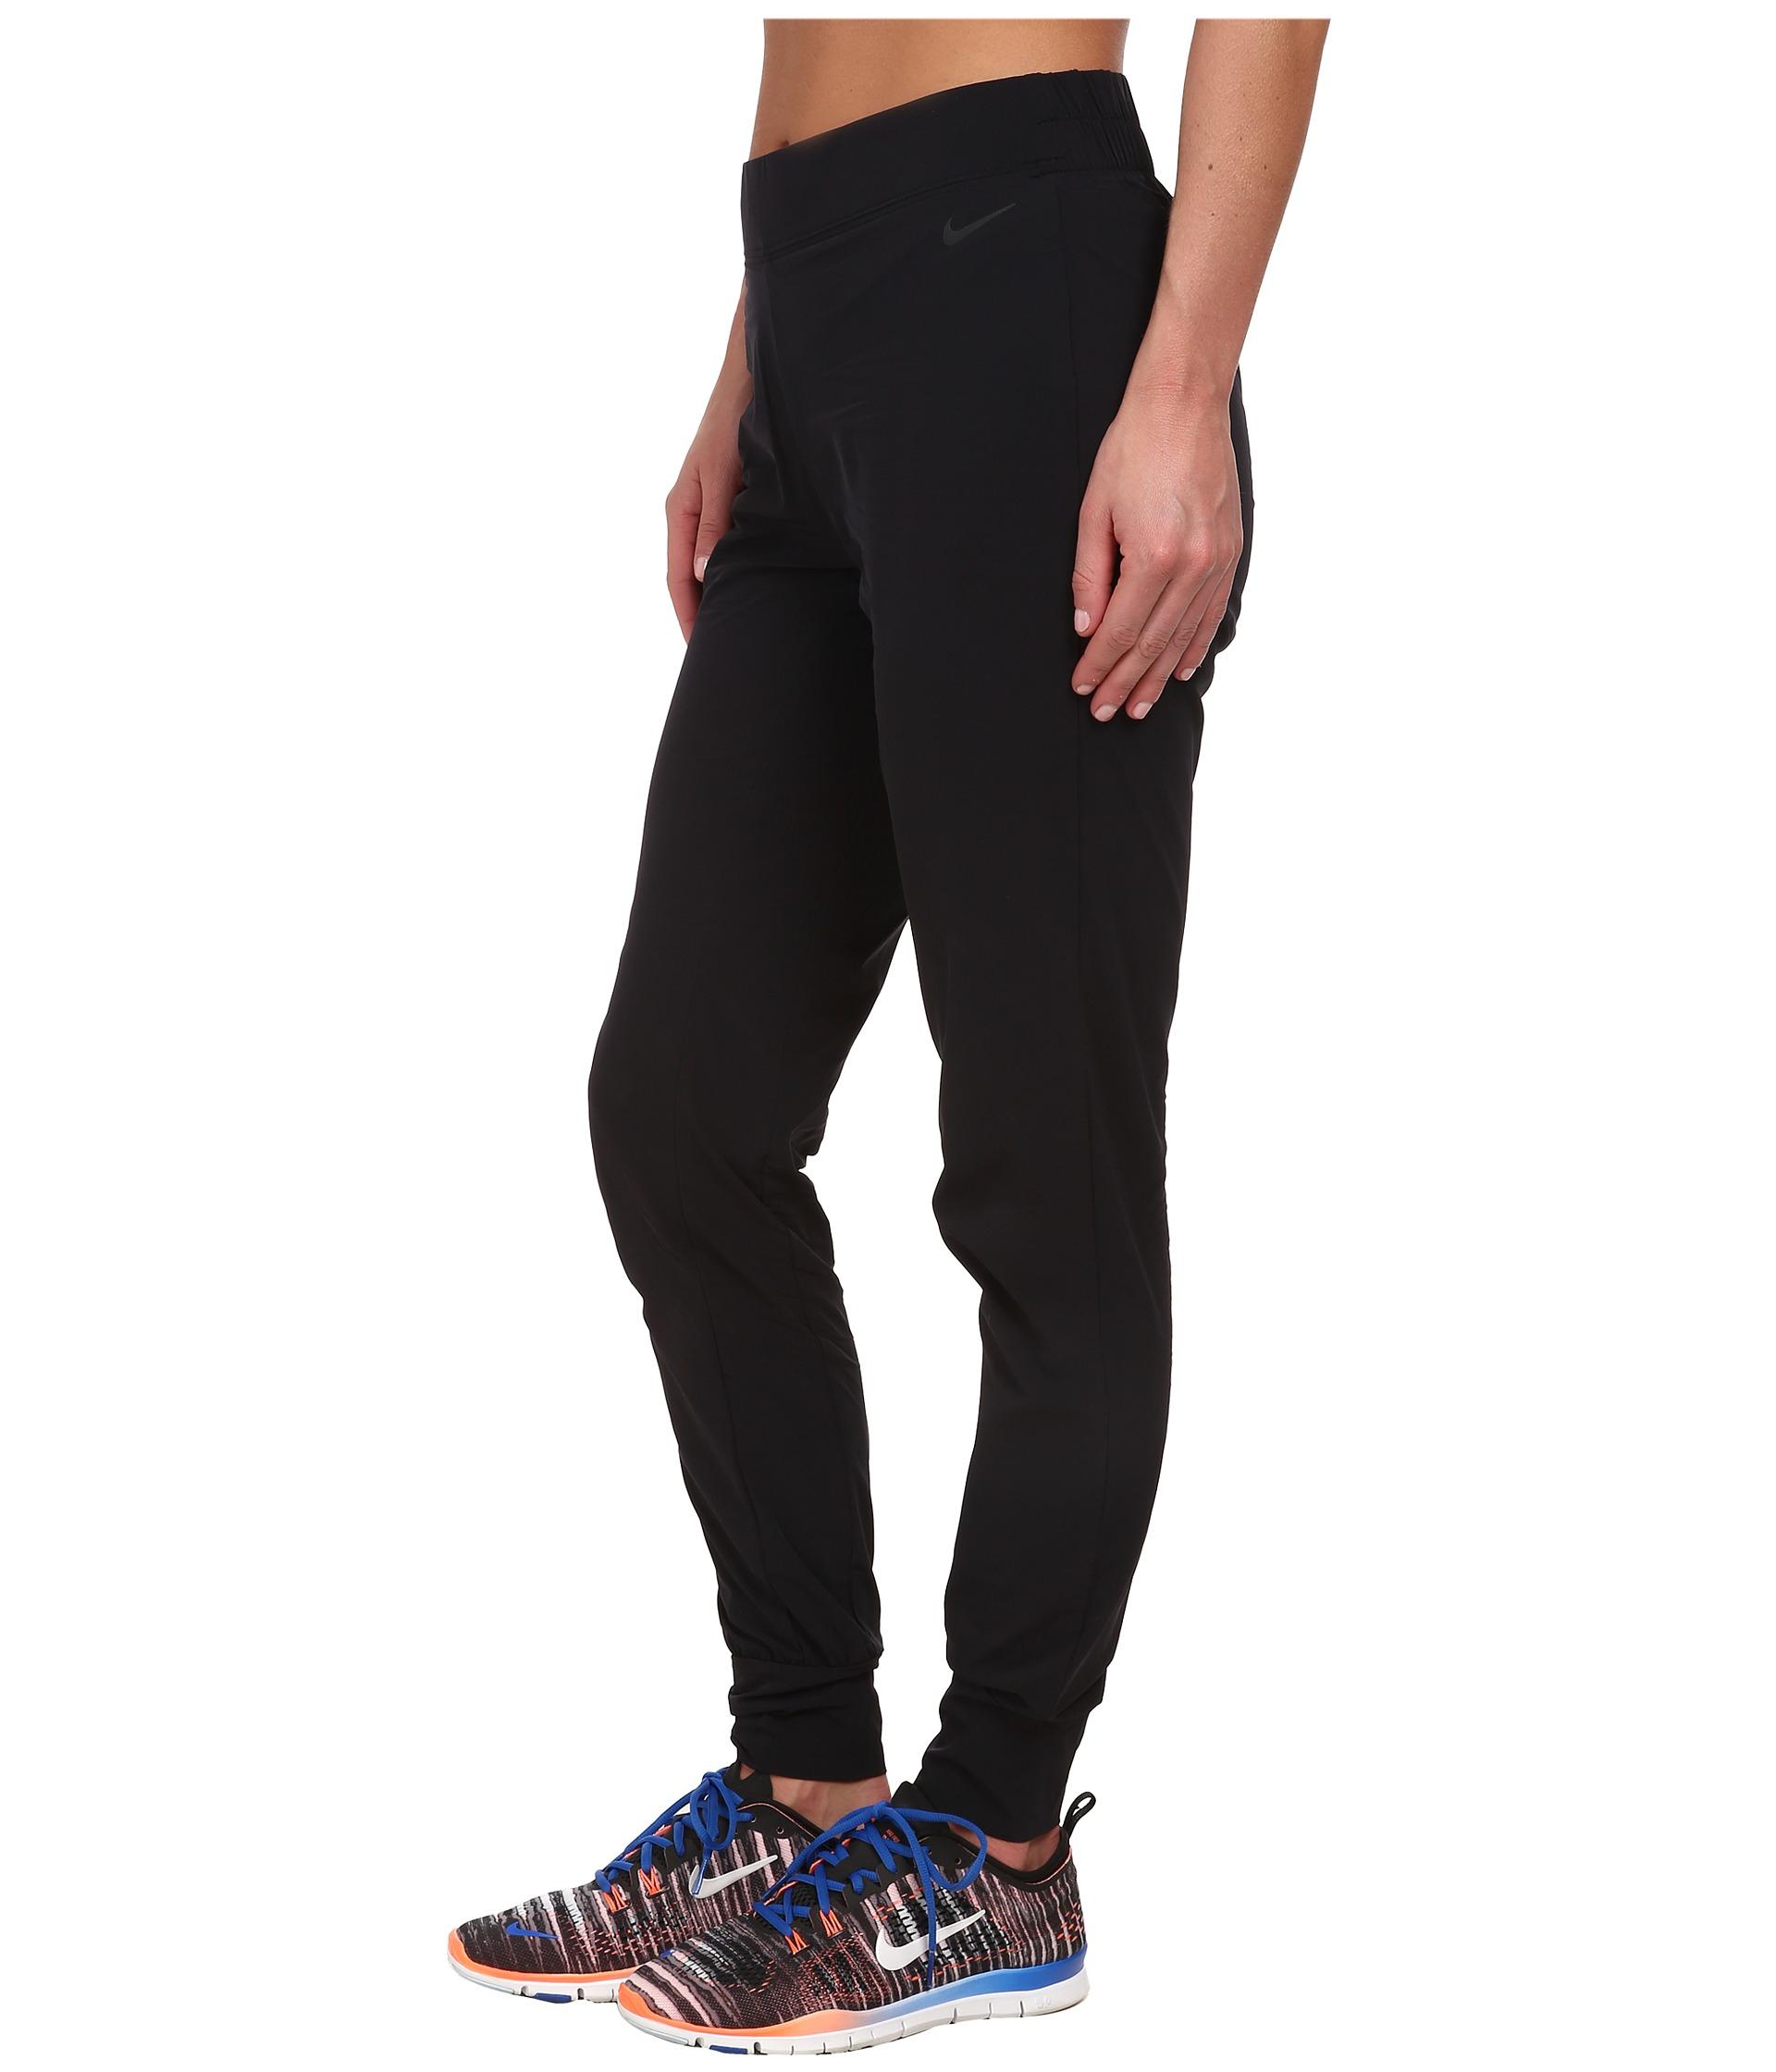 900c4344b2e4 Lyst - Nike Bliss Woven Pant in Black